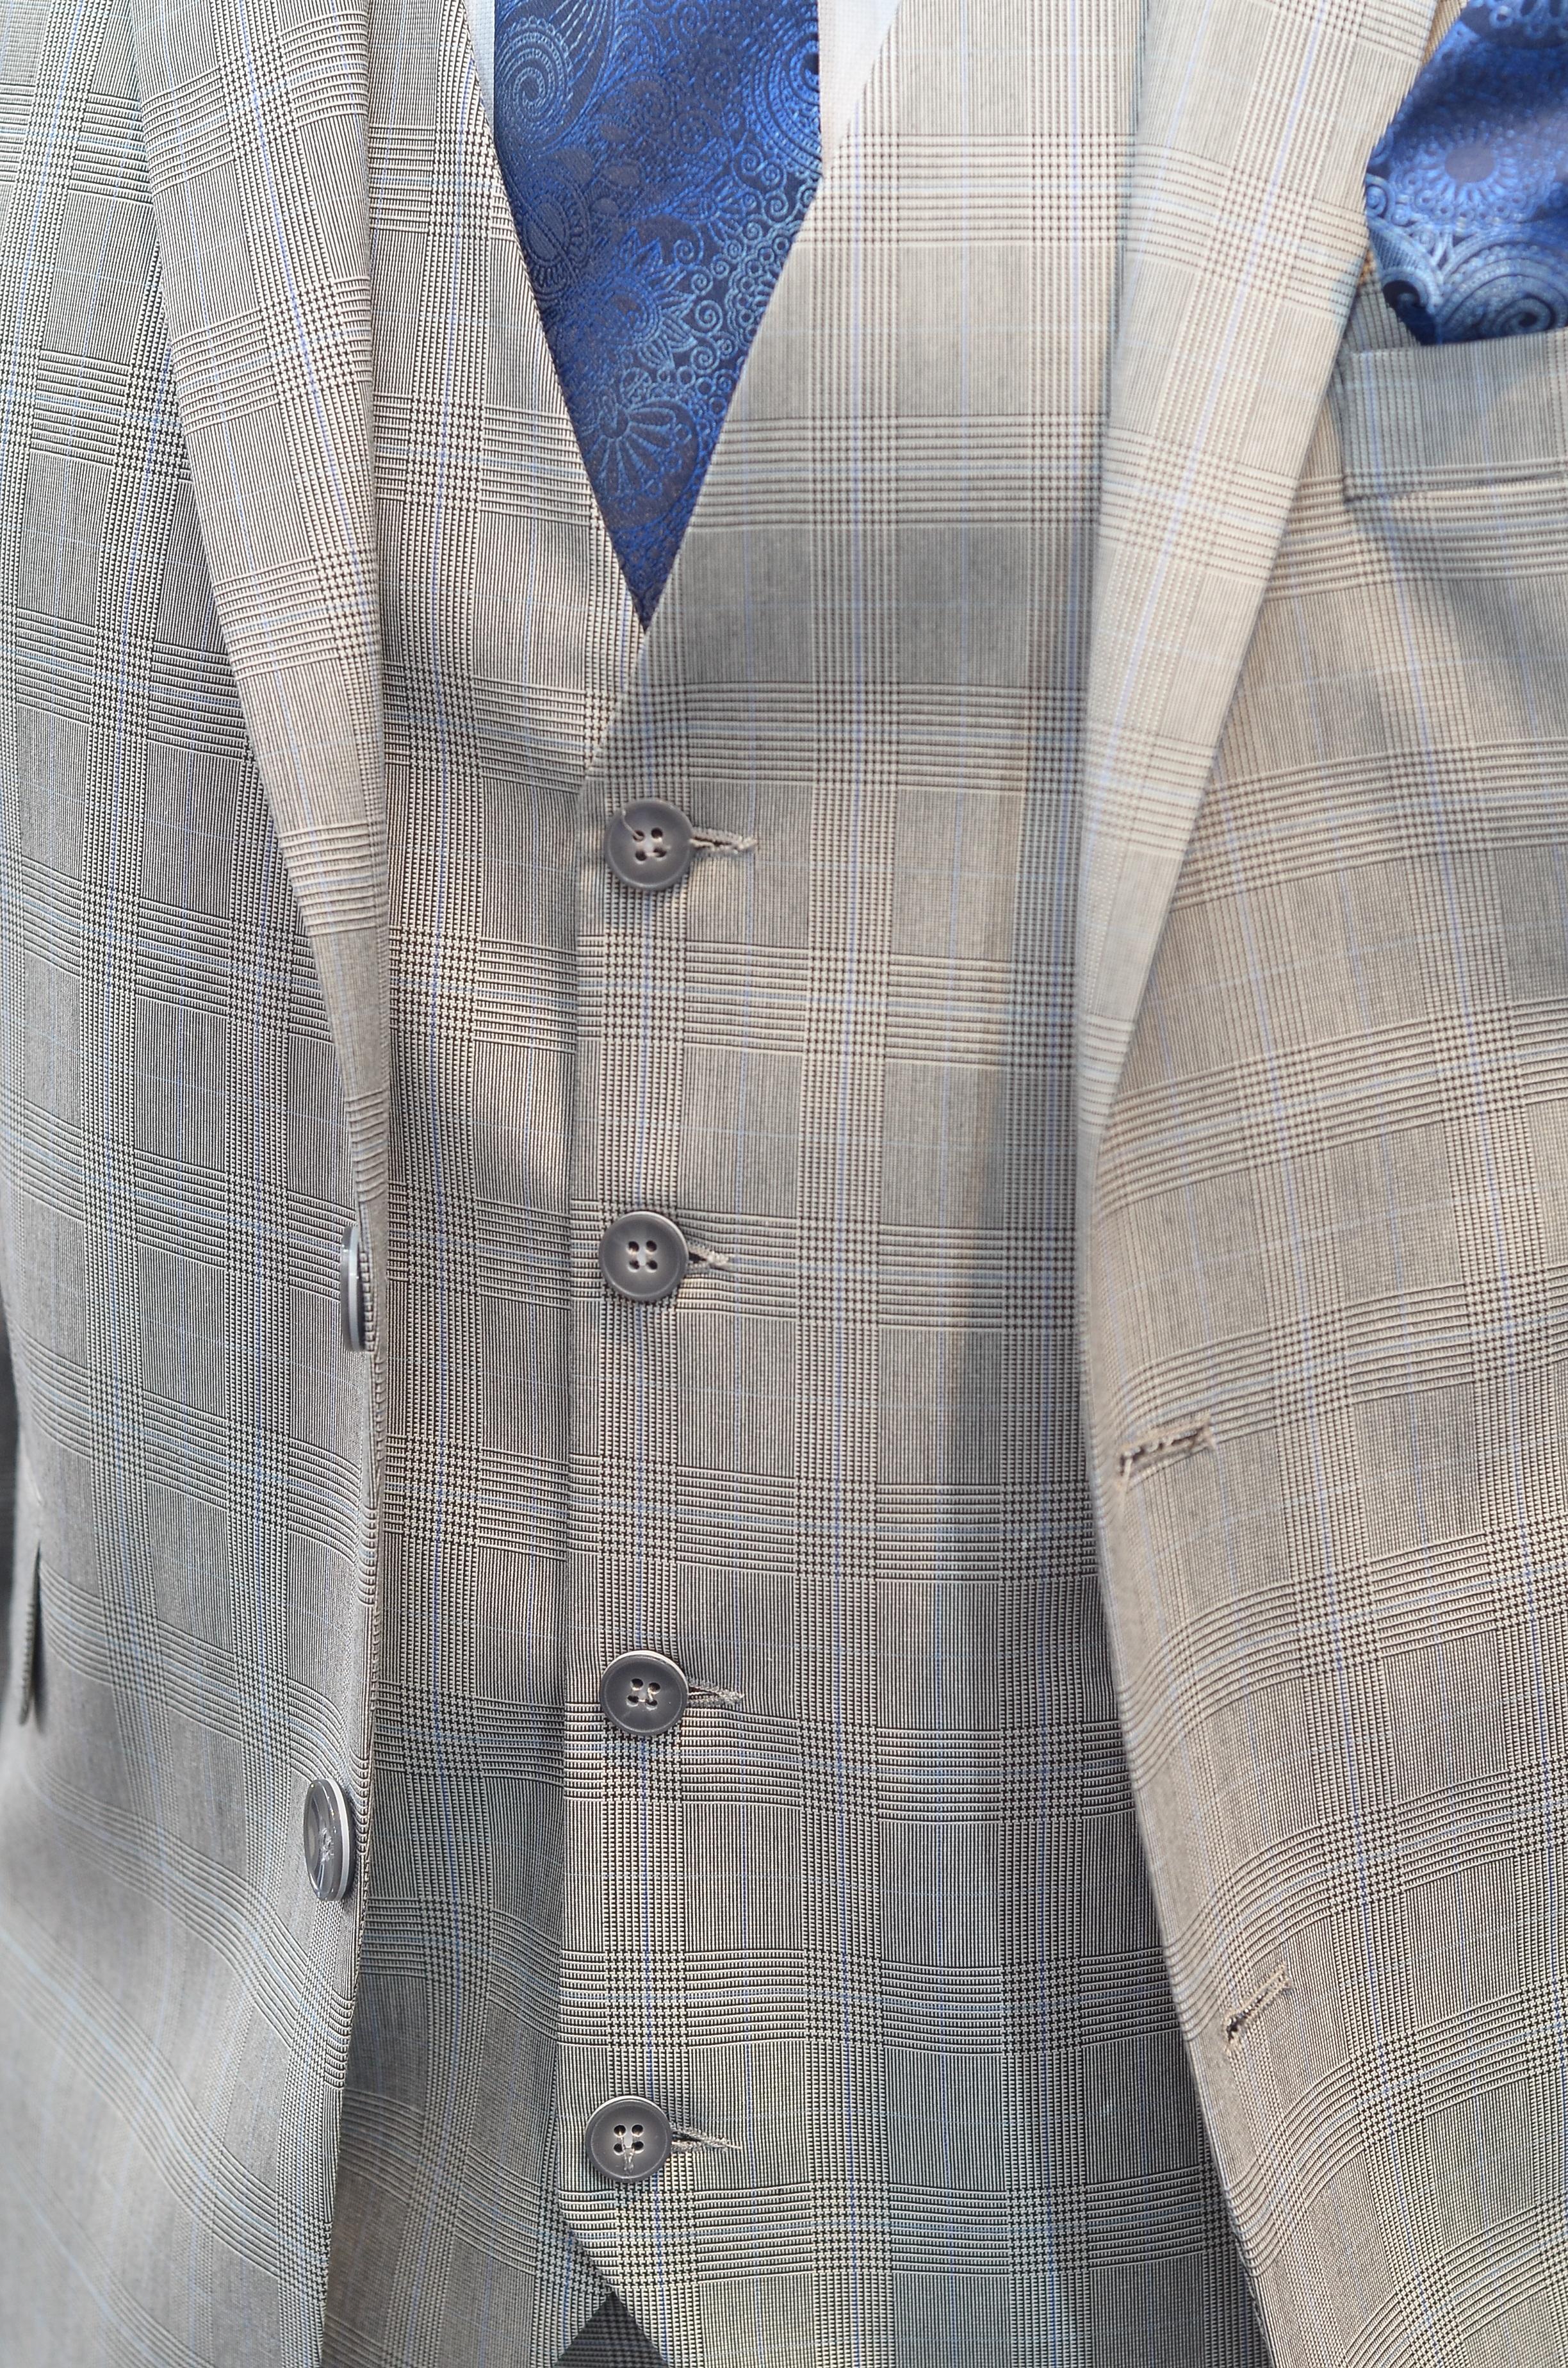 Gambar Sesuai Pola Dasi Jaket Pakaian Luar Tombol Kerah